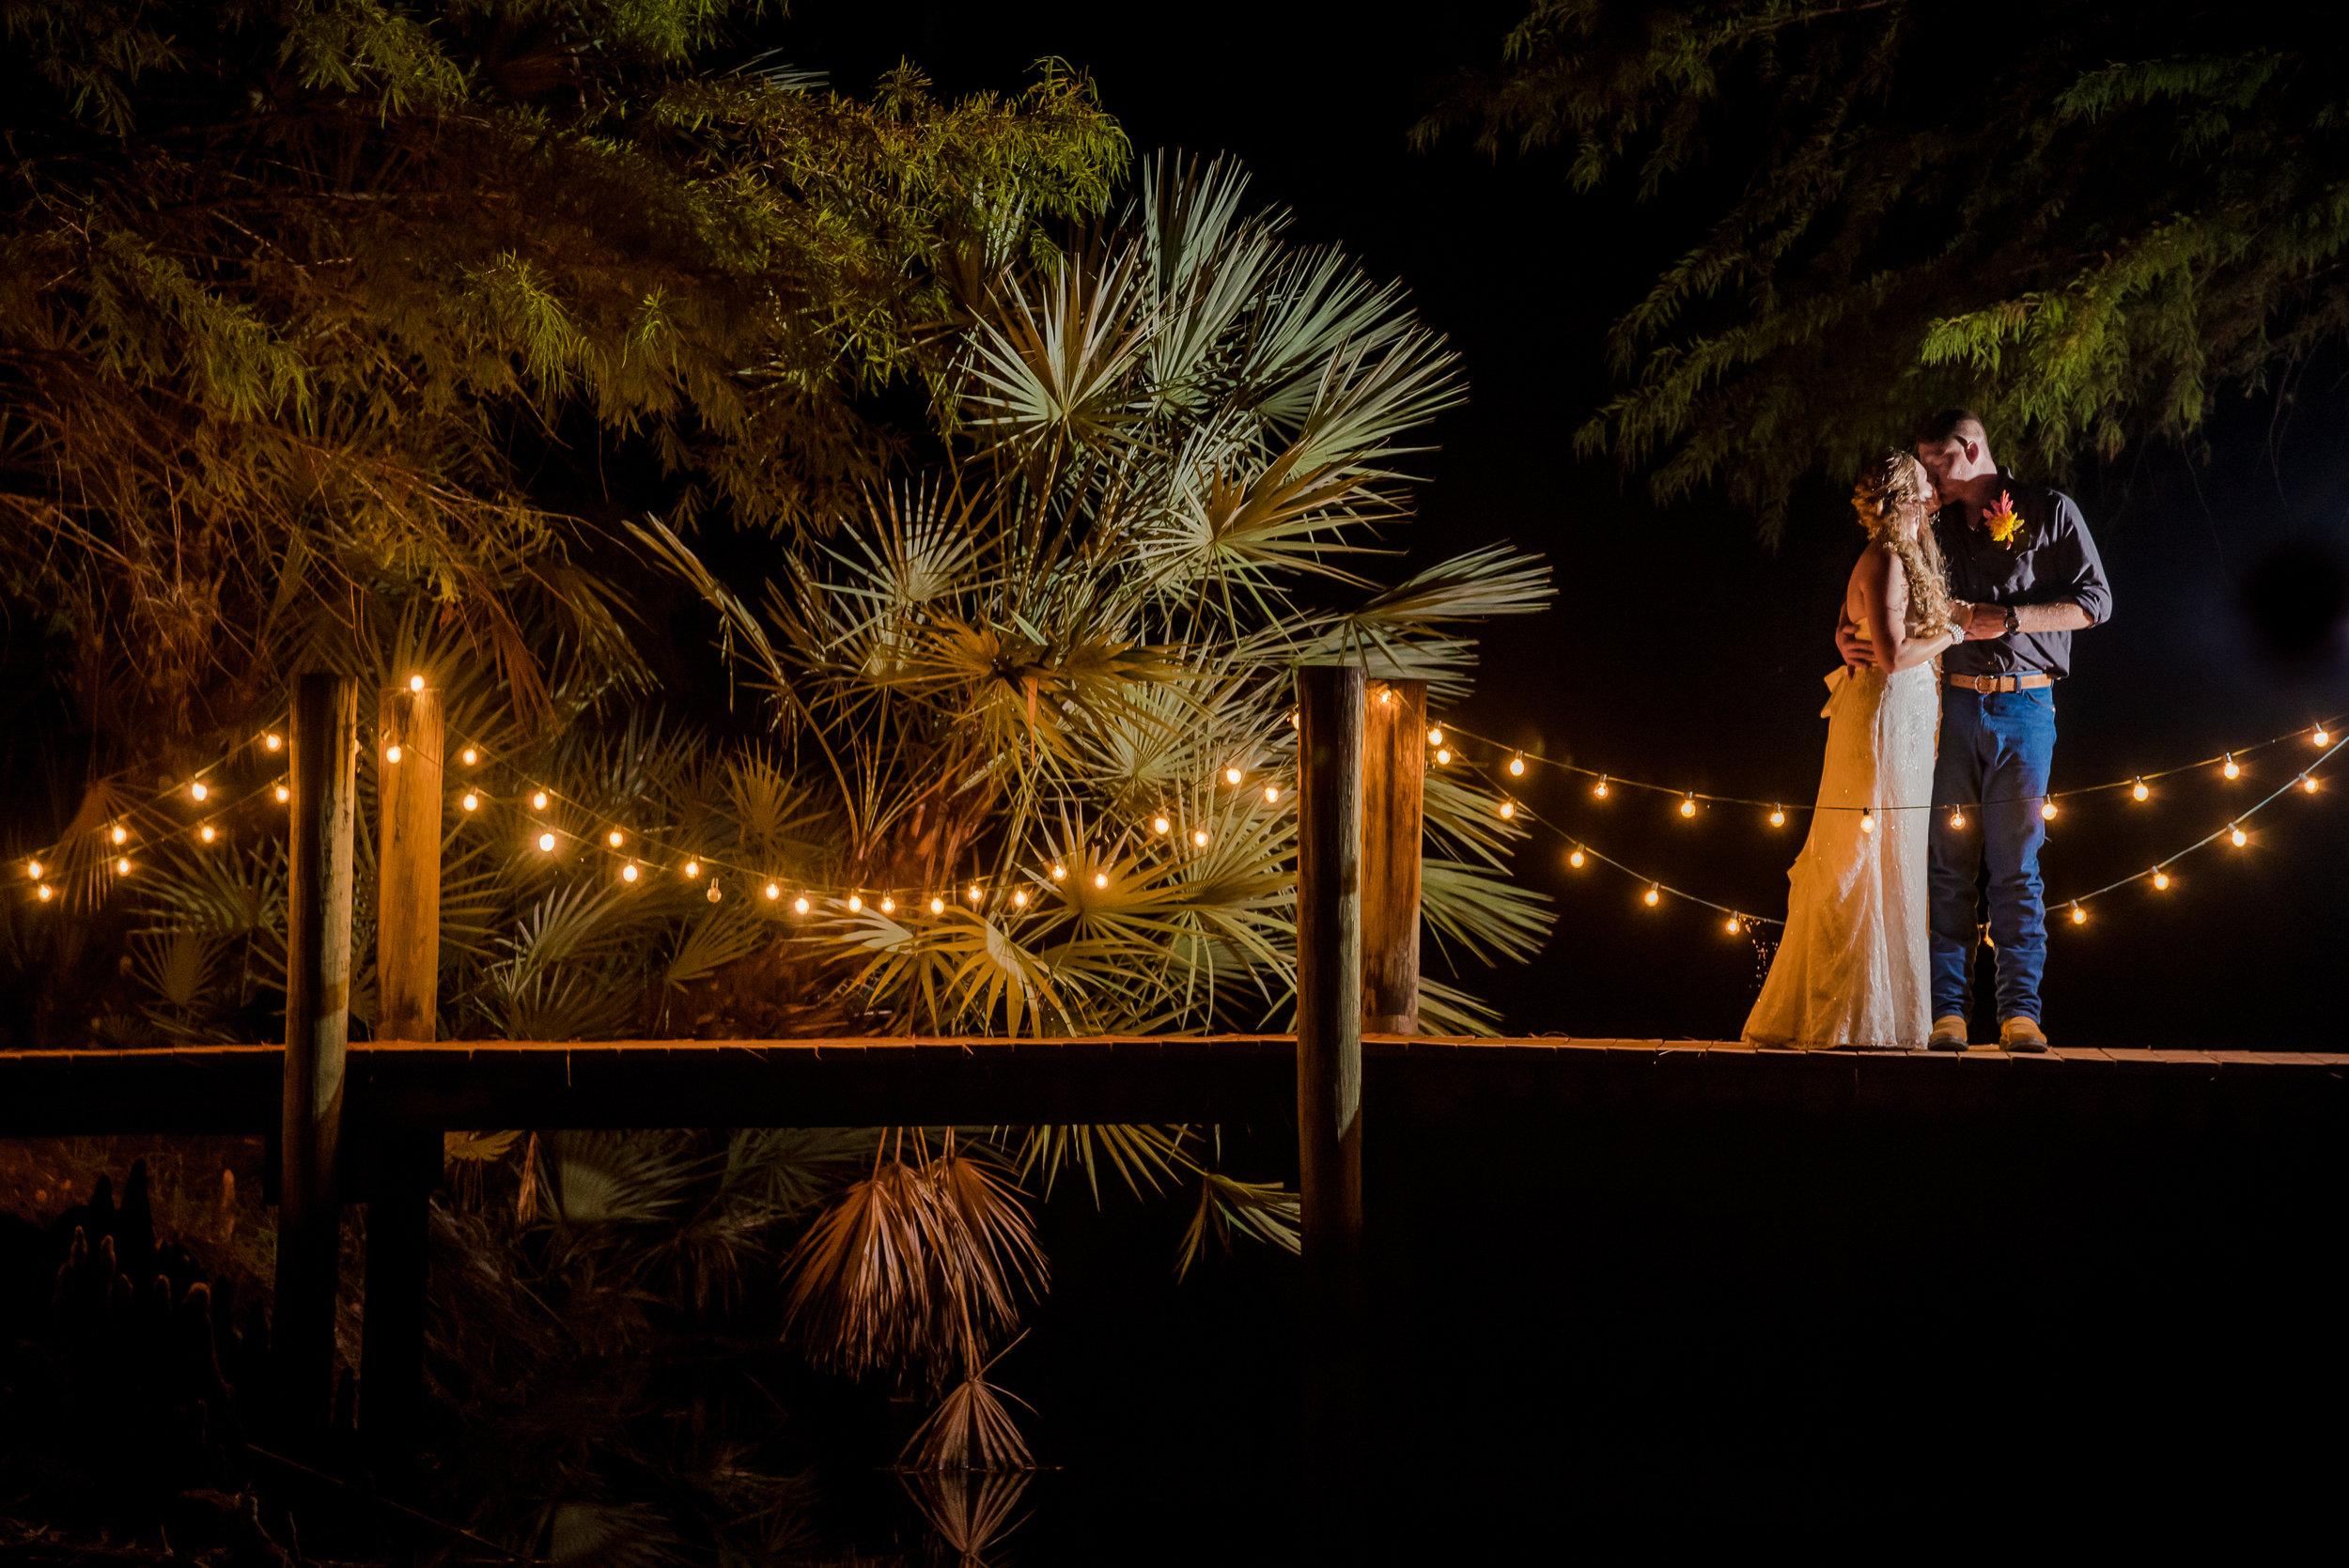 Florida-cowbow-fall-theme-amanda-wedding-1-3.jpg